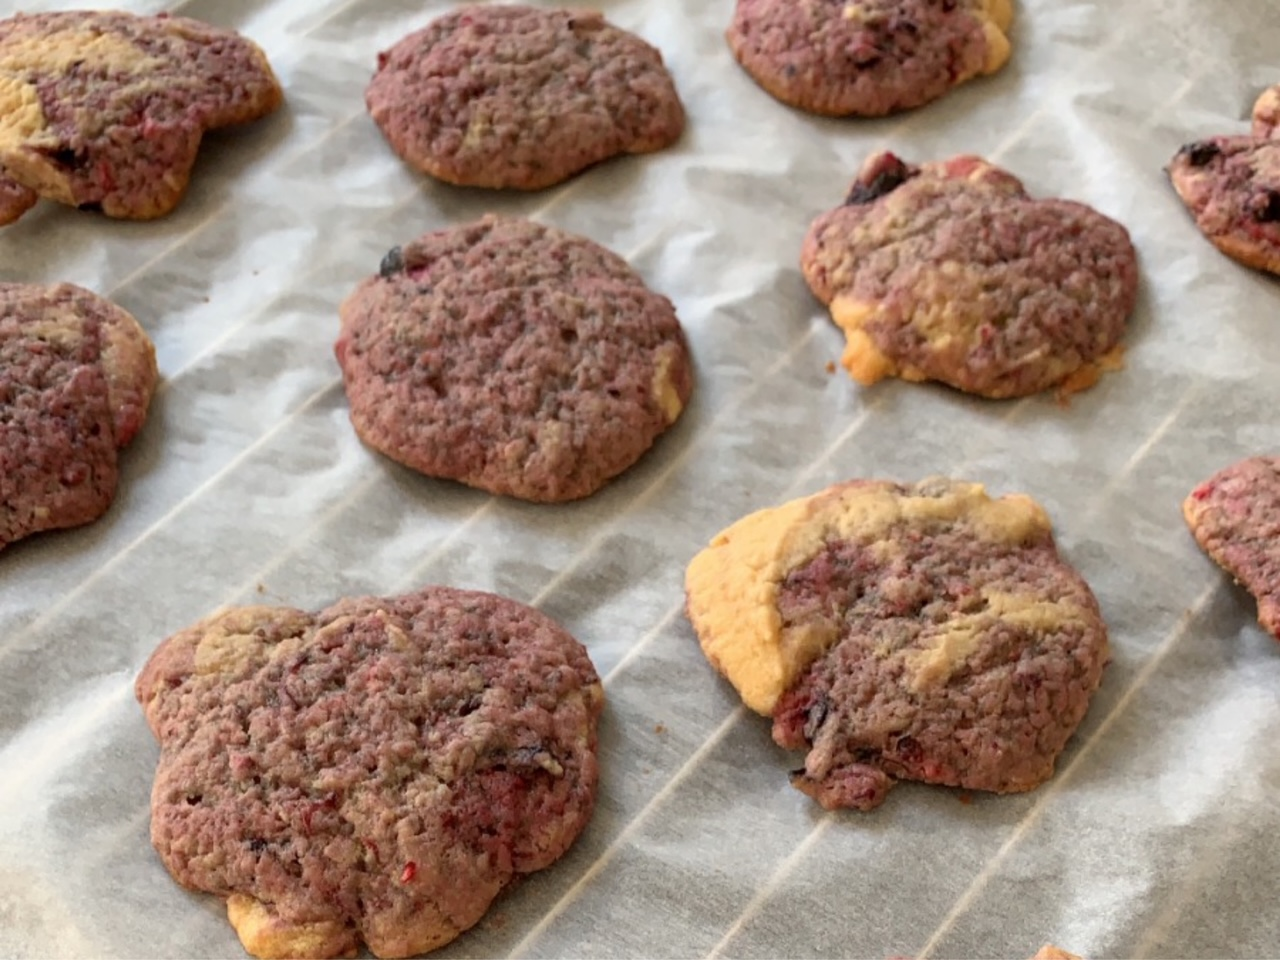 Cookies with berries